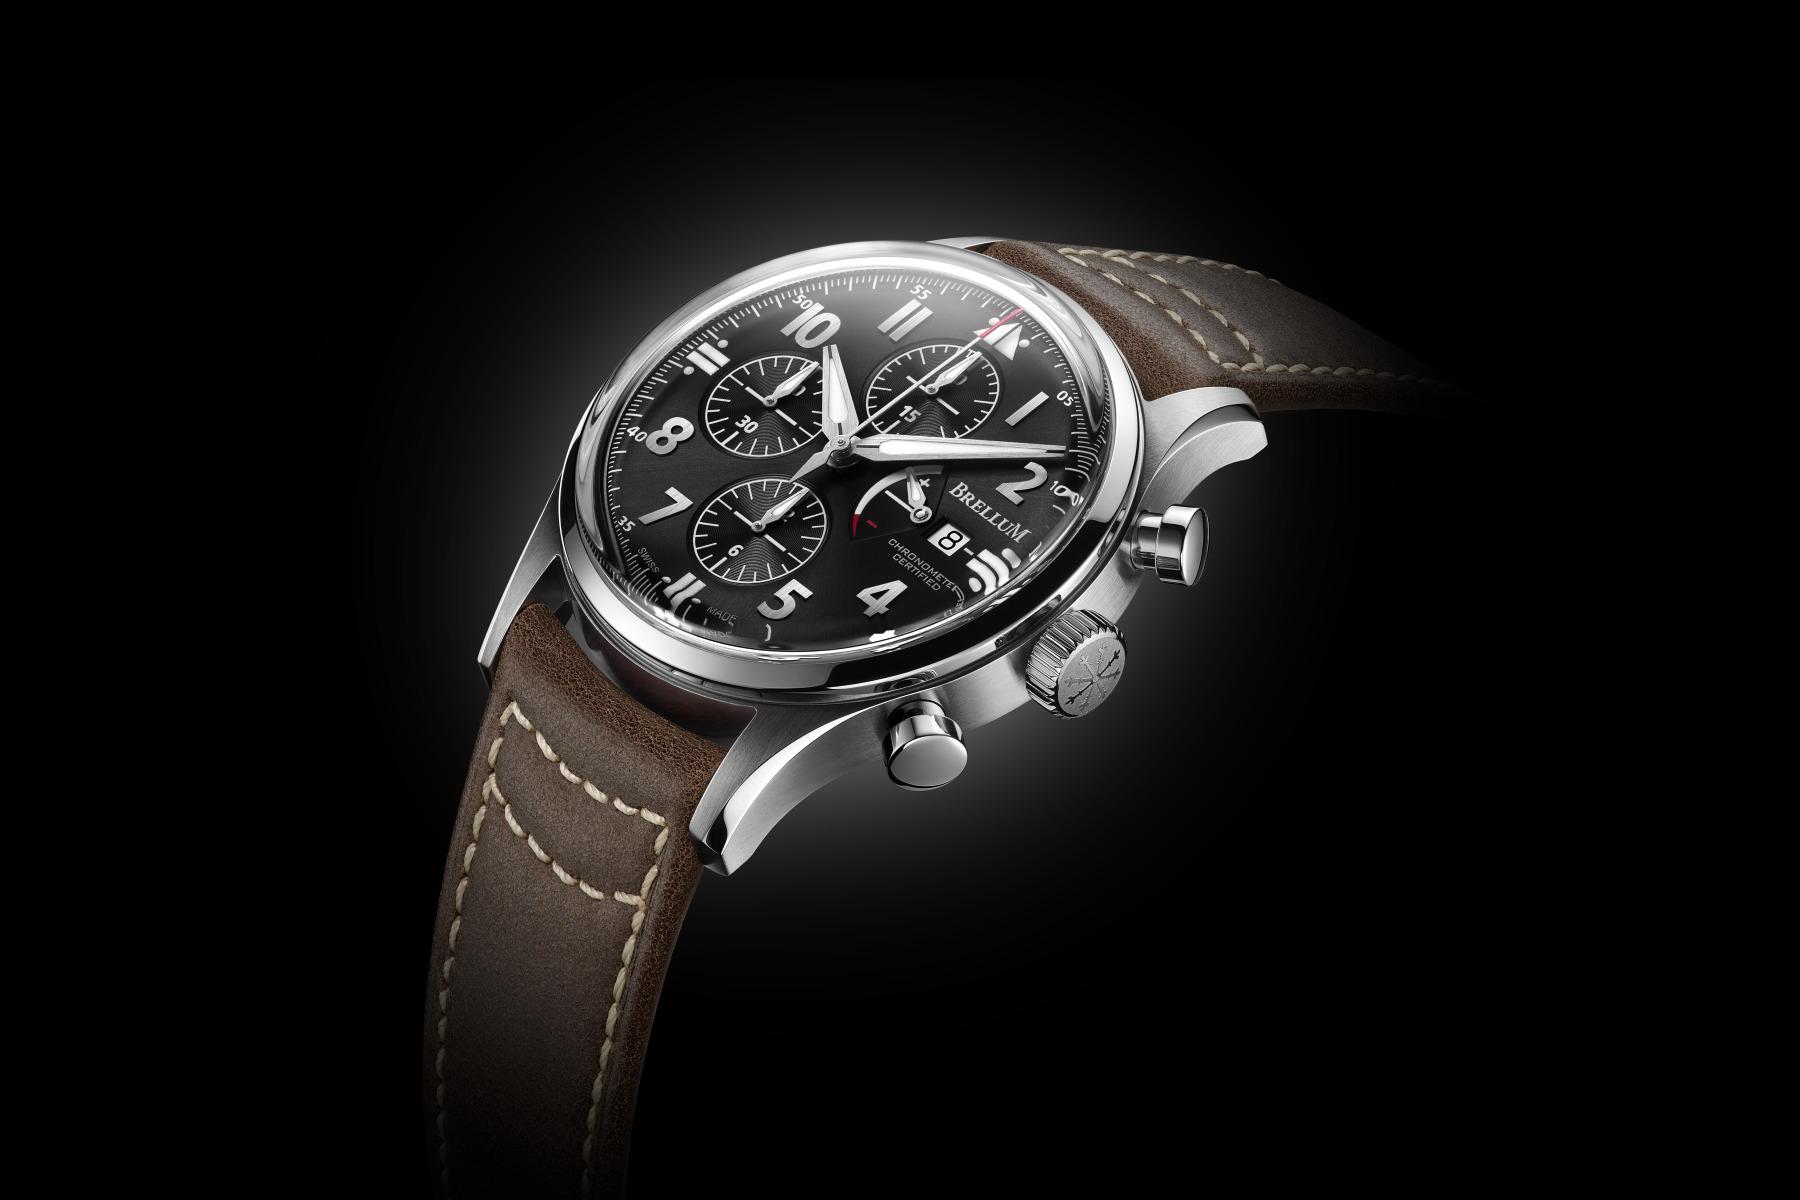 Brellum Pilot Power Gauge Chronometer - Monochrome Watches